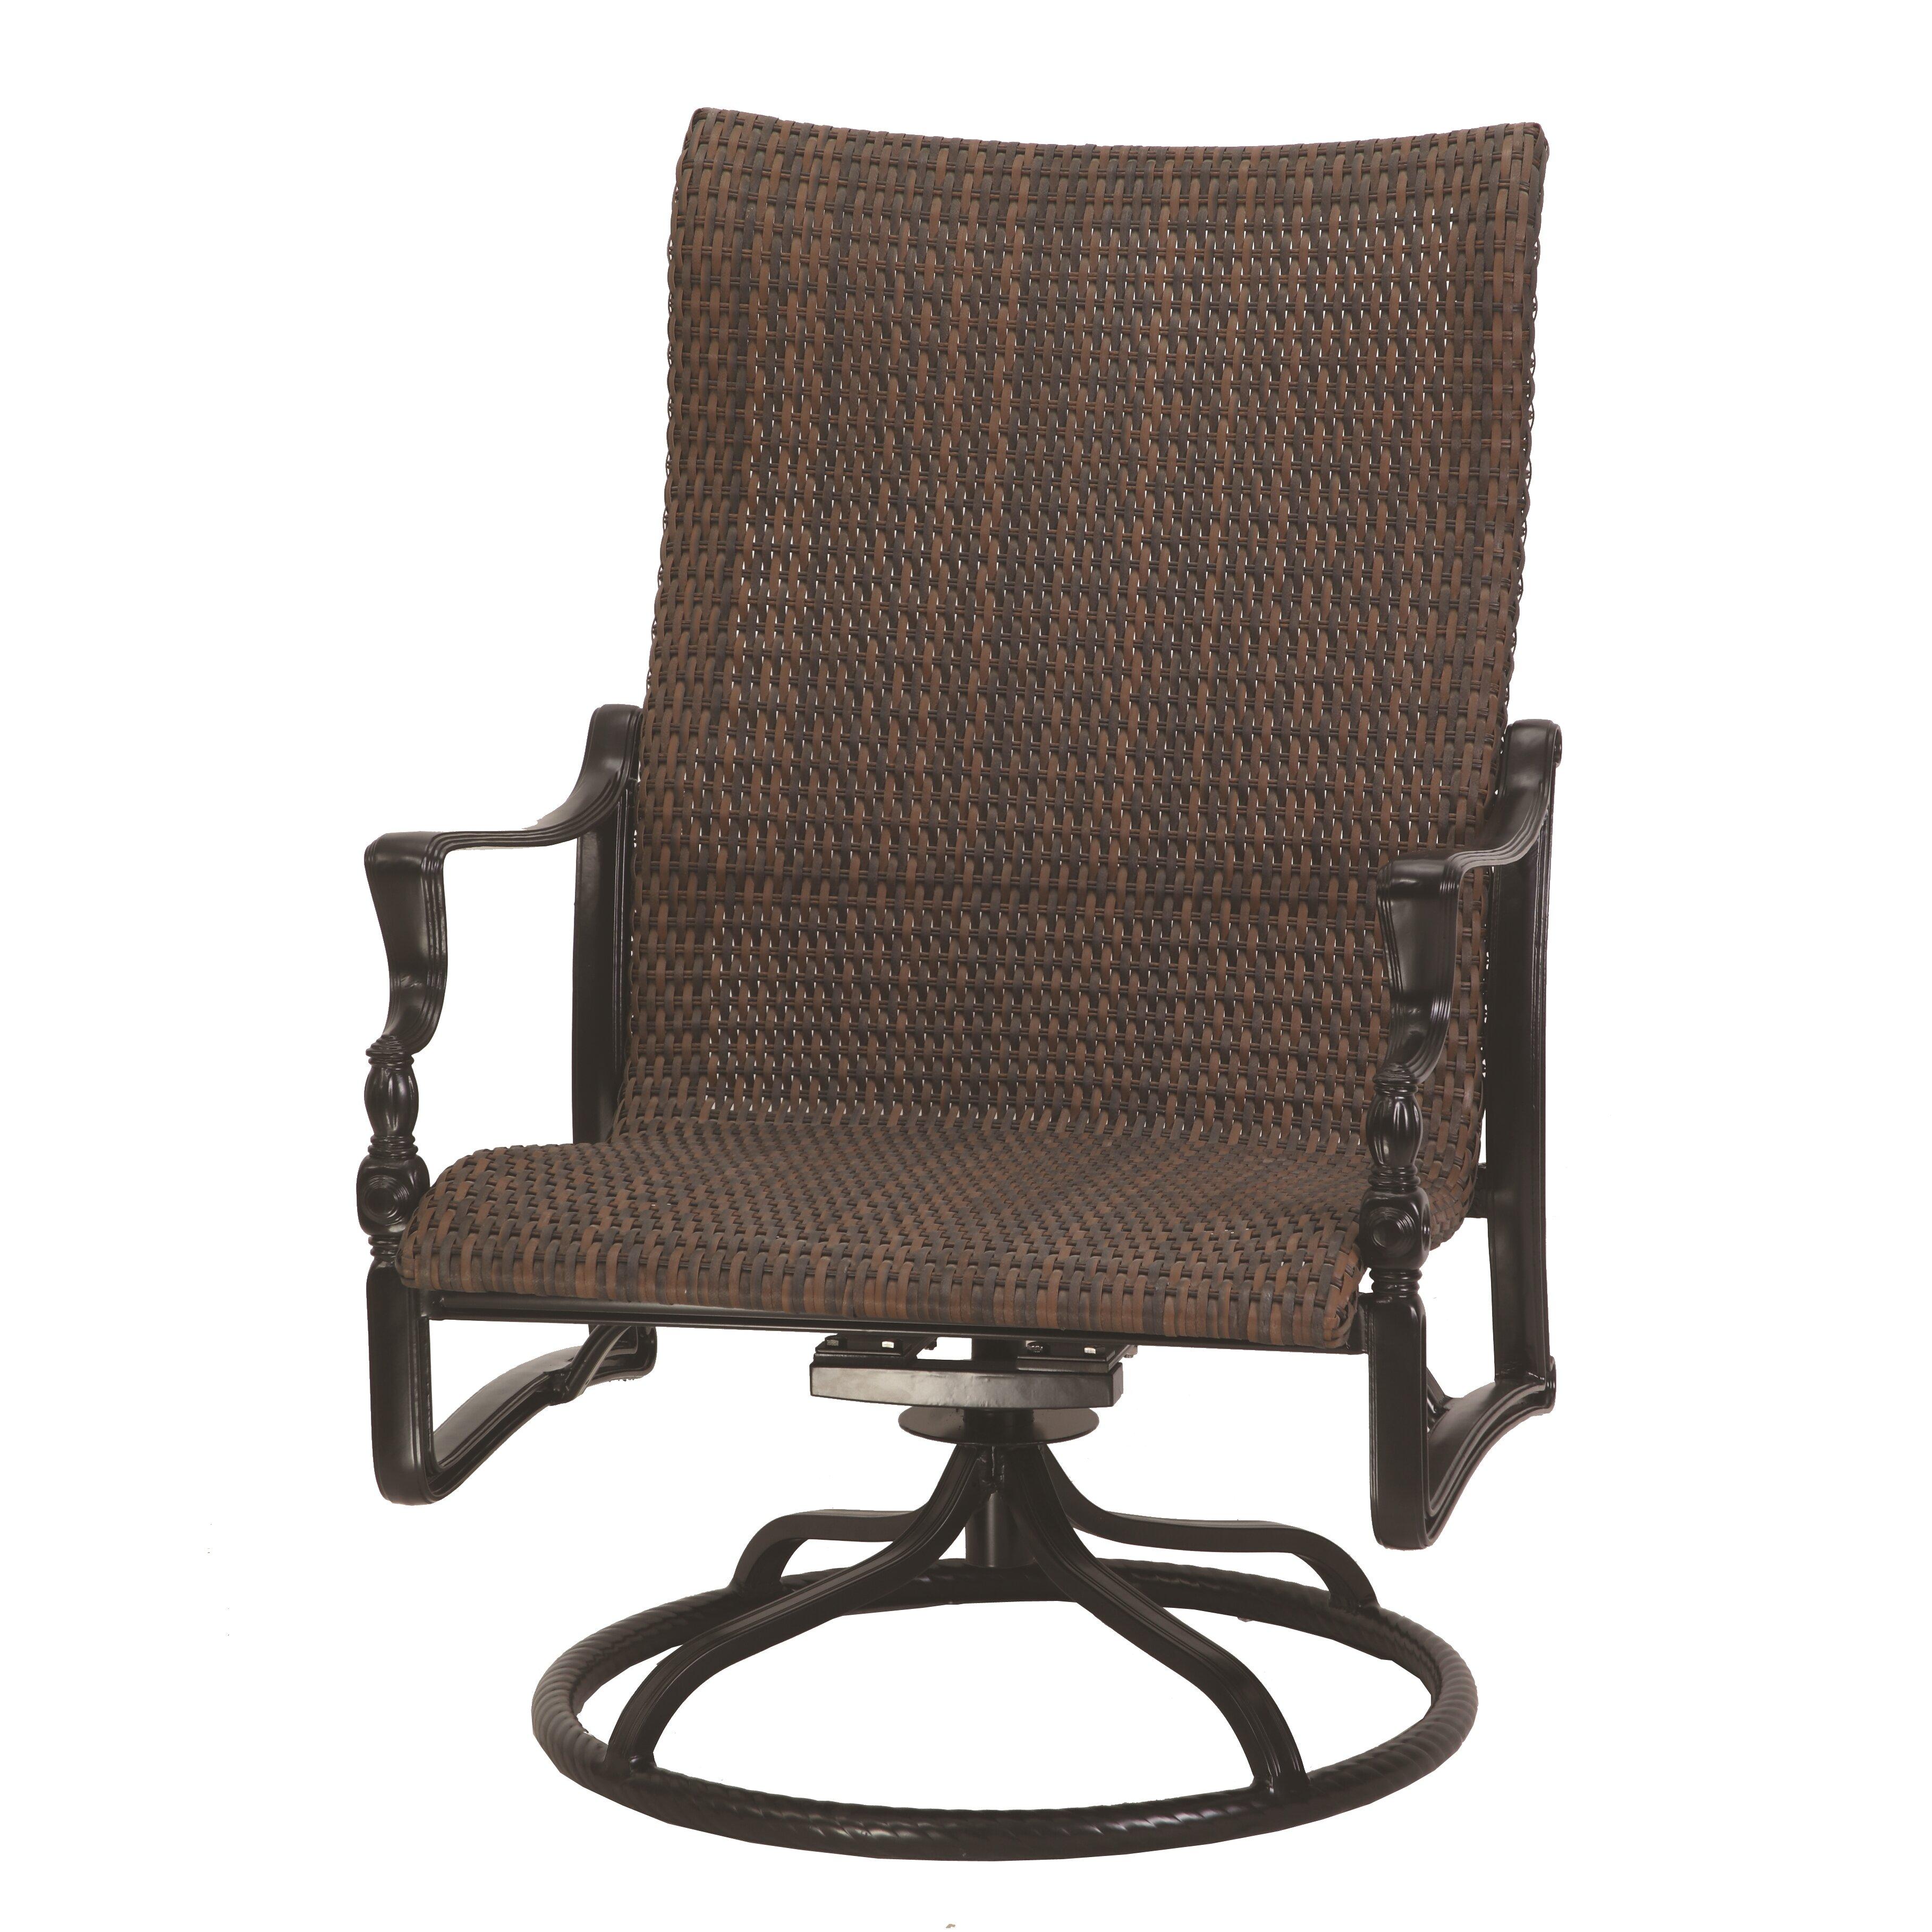 Bel Air High Back Swivel Rocking Lounge Chair